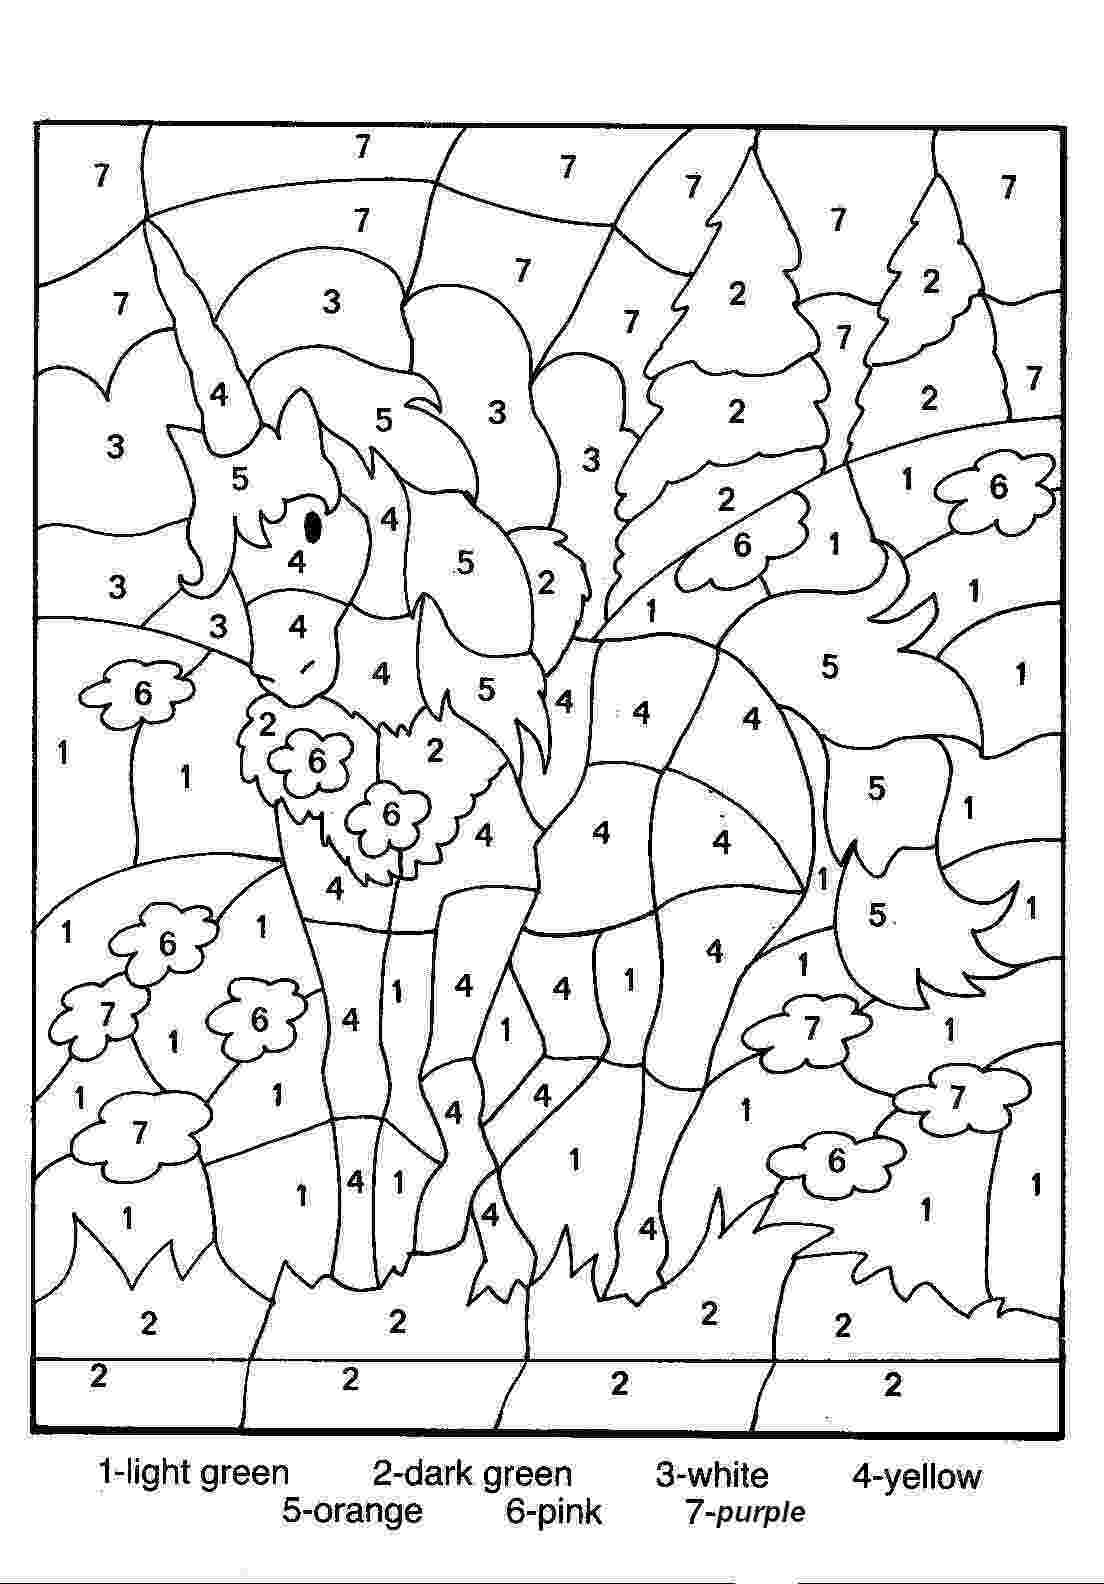 coloring by number worksheets color by number worksheet free kindergarten math coloring number by worksheets